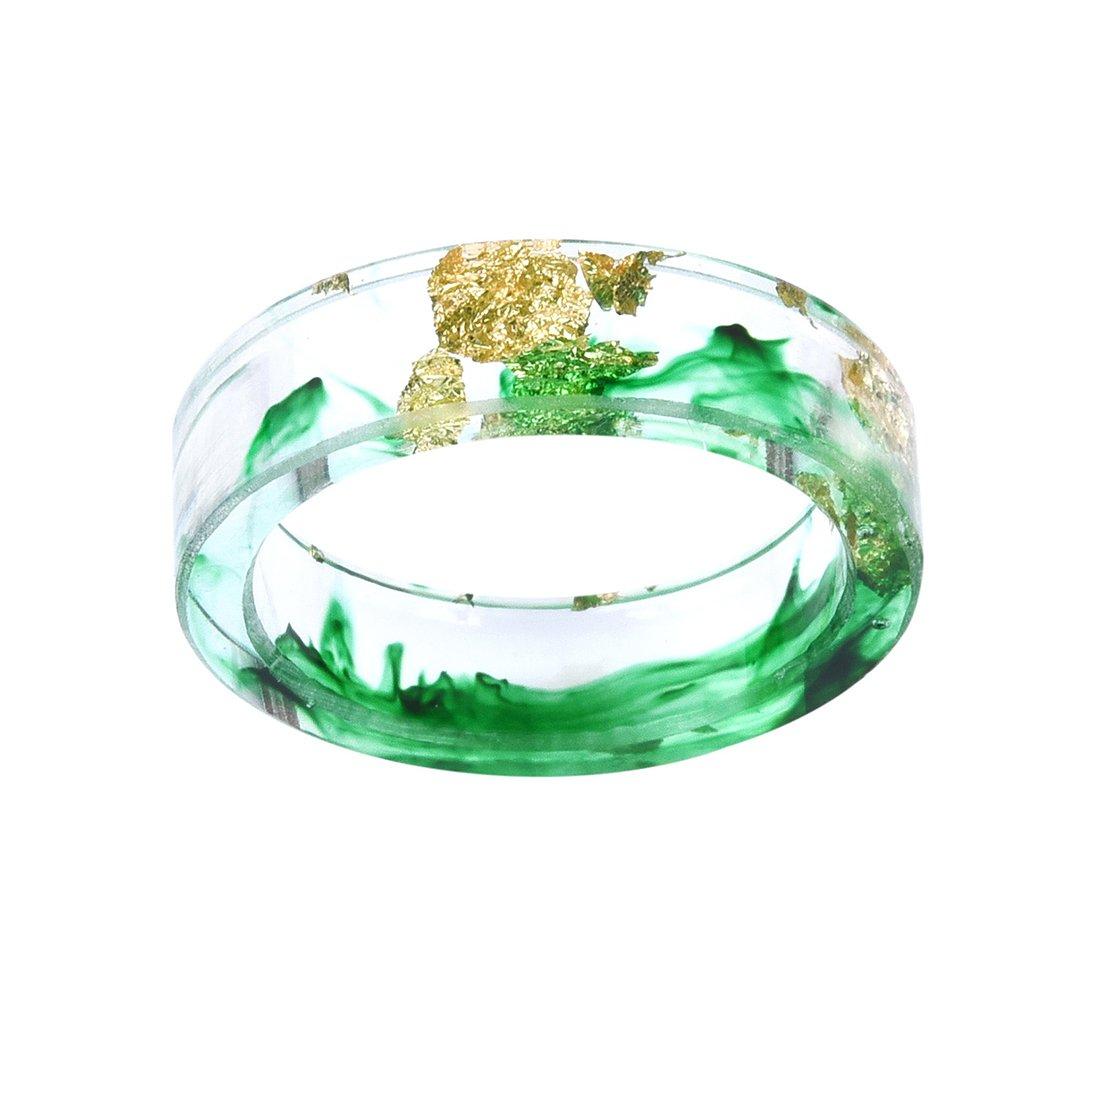 DALARAN Handmade Irregular Green Ink Pattern Transparent Resin Ring Size 8